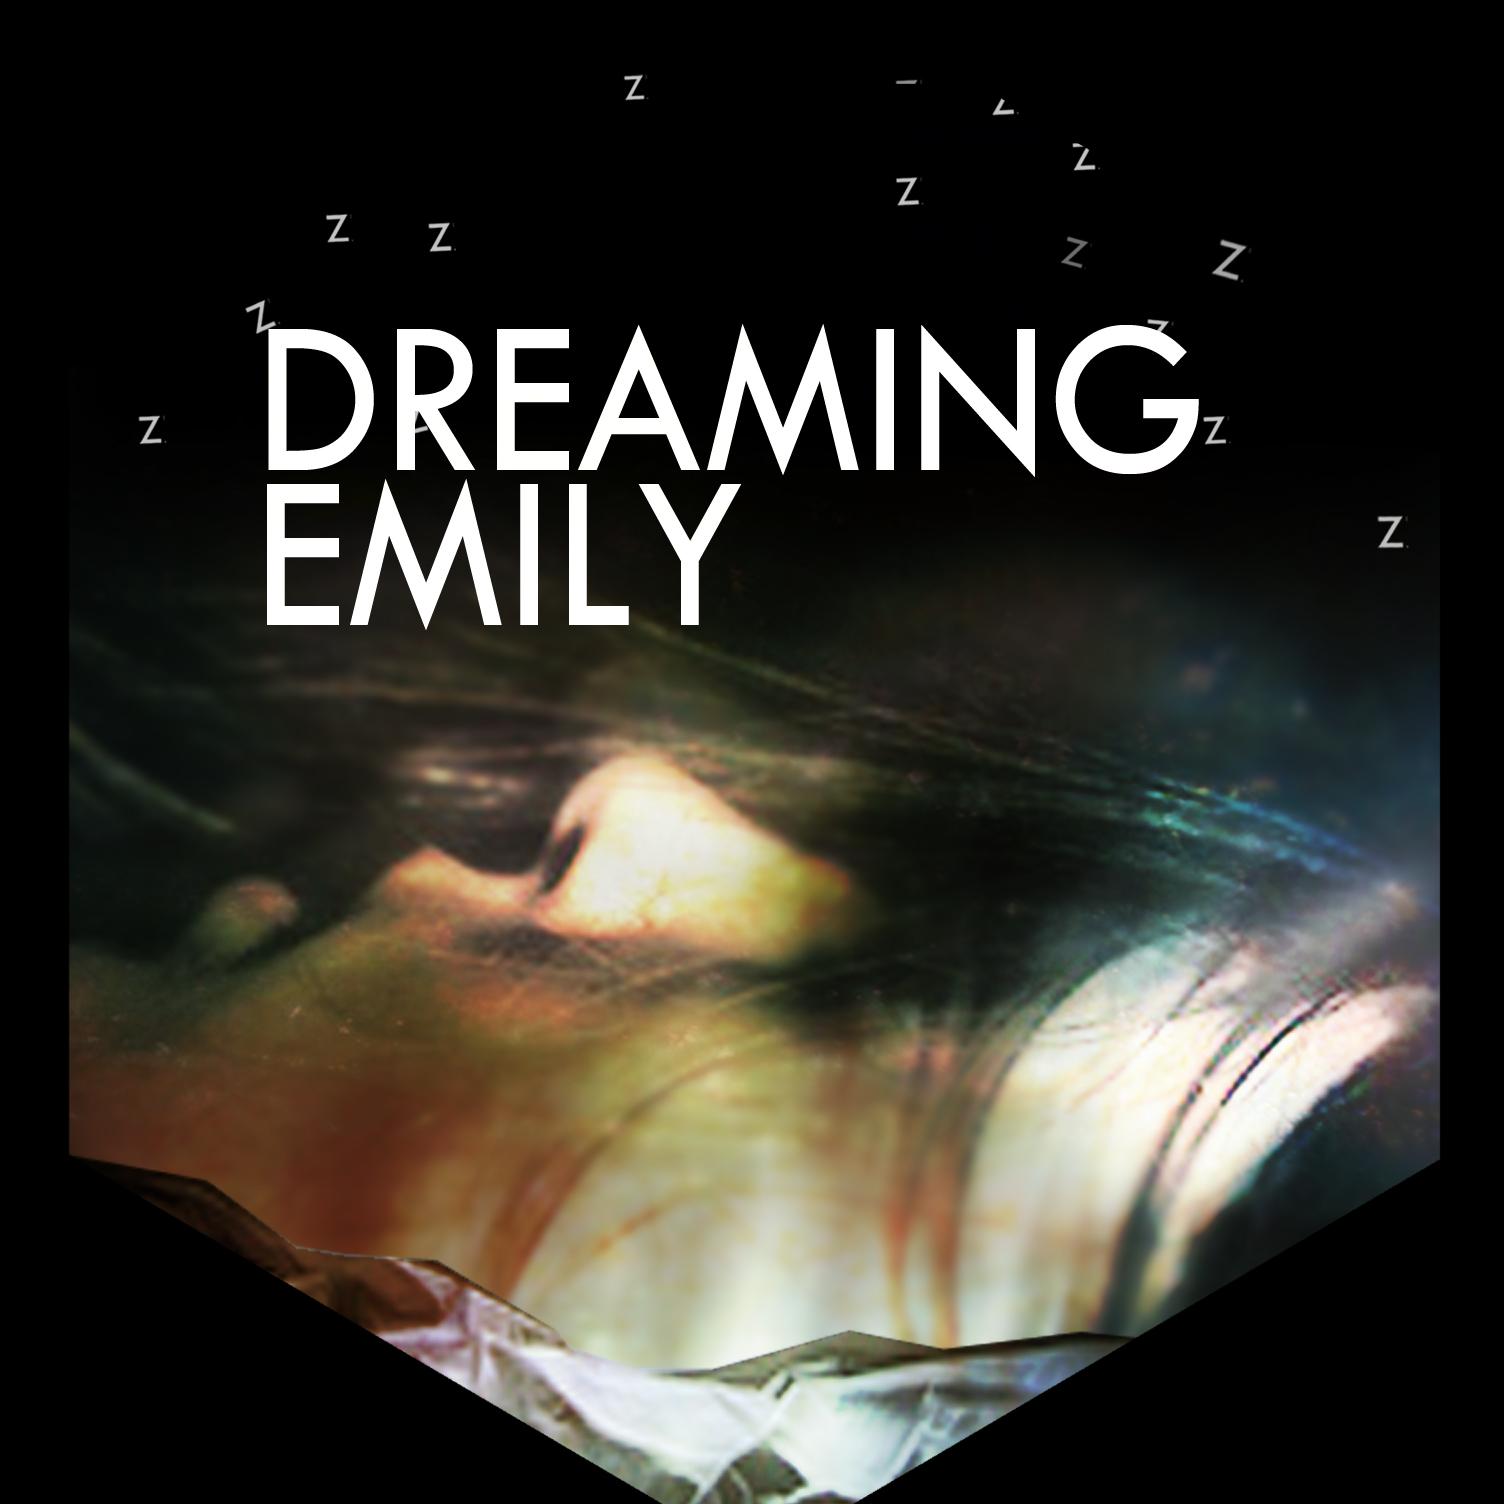 Dreaming Emily